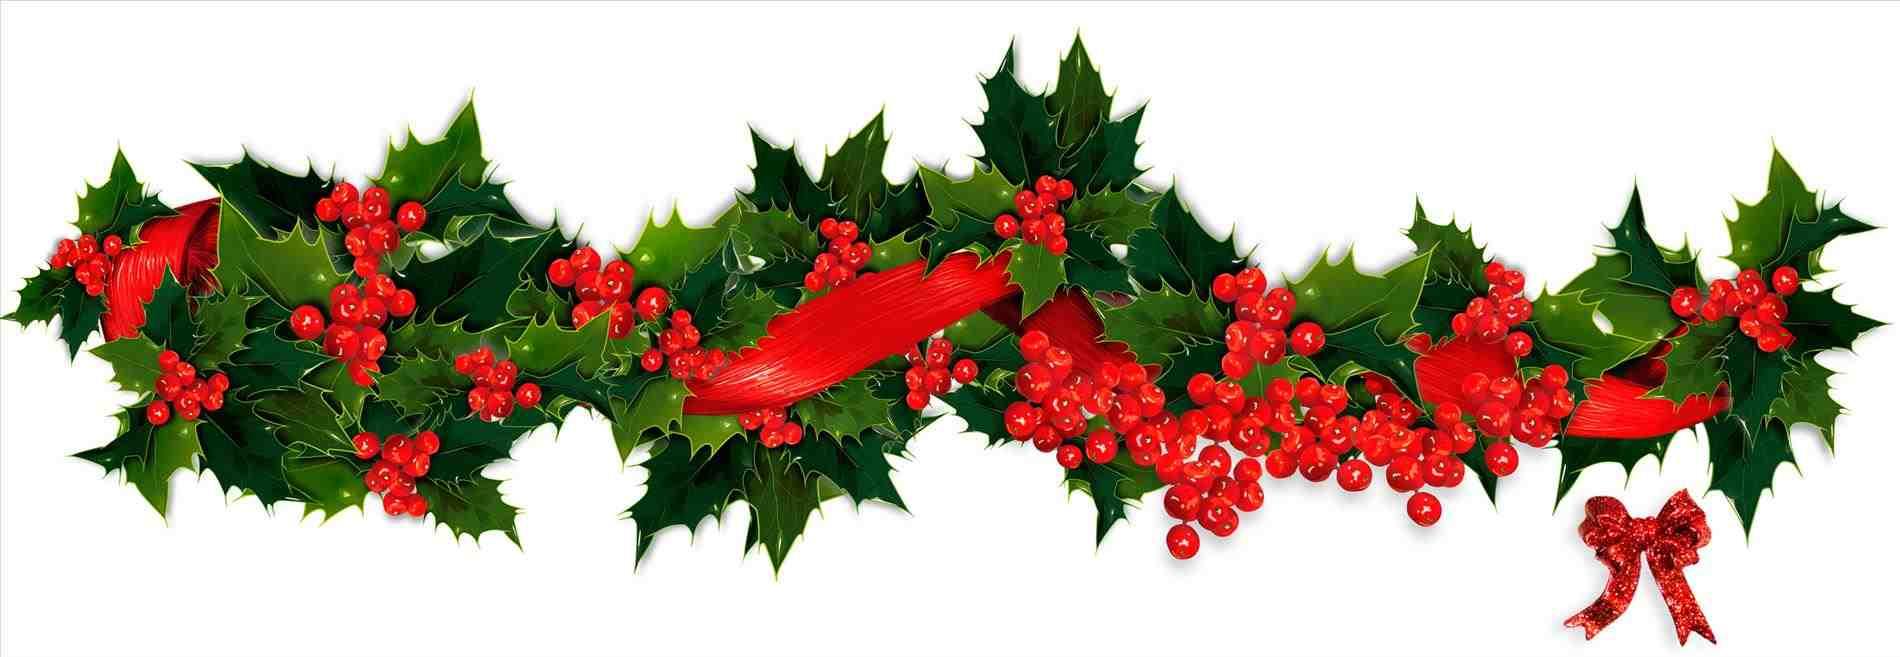 1900x657 Free Christmas Holly Clip Art Cheminee.website